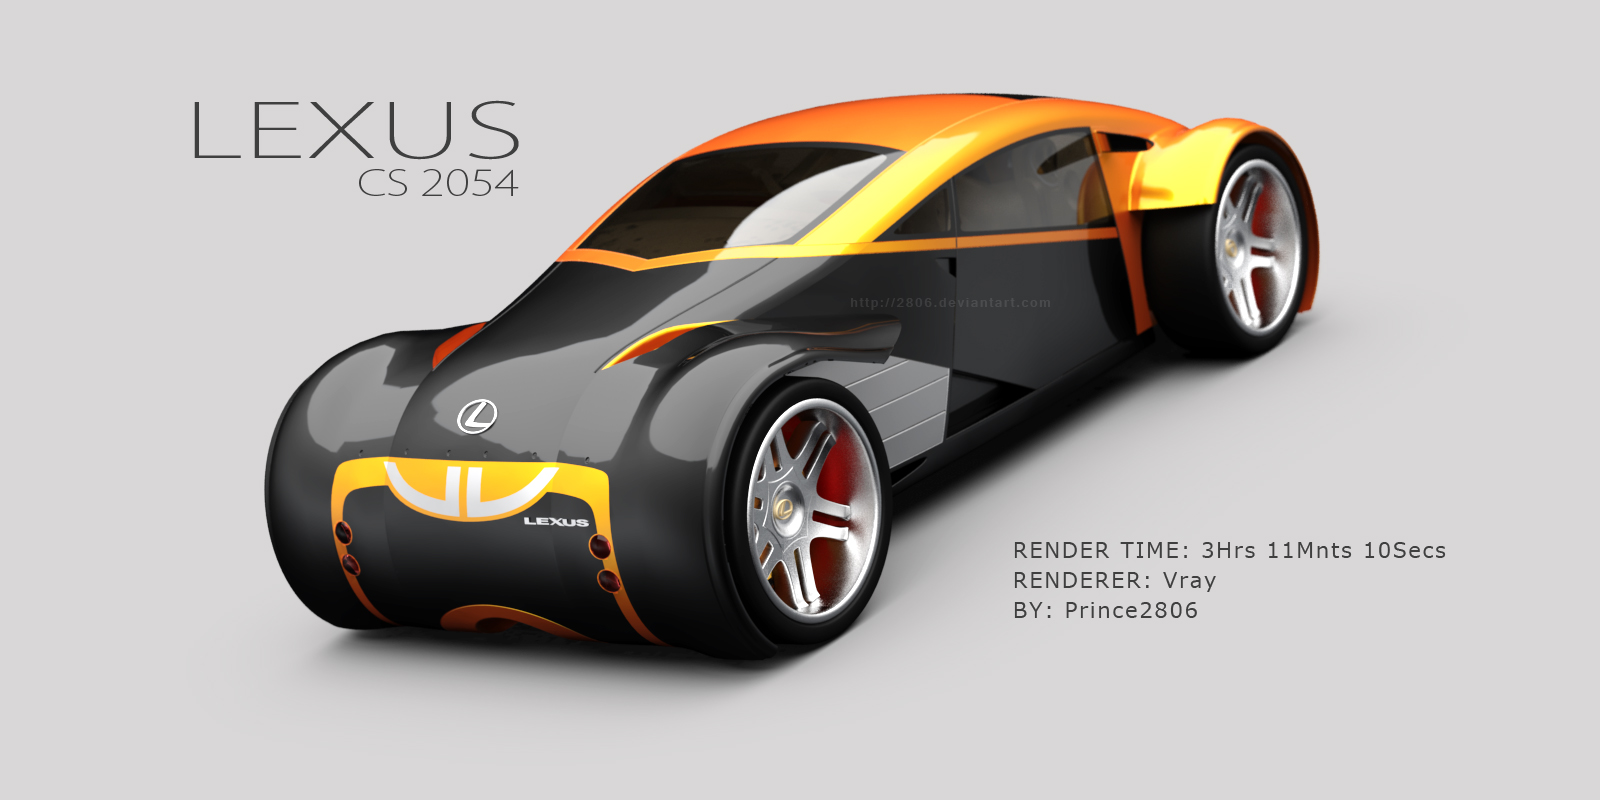 2806 96 32 Lexus CS 2054 Orange_by 2806 by 2806